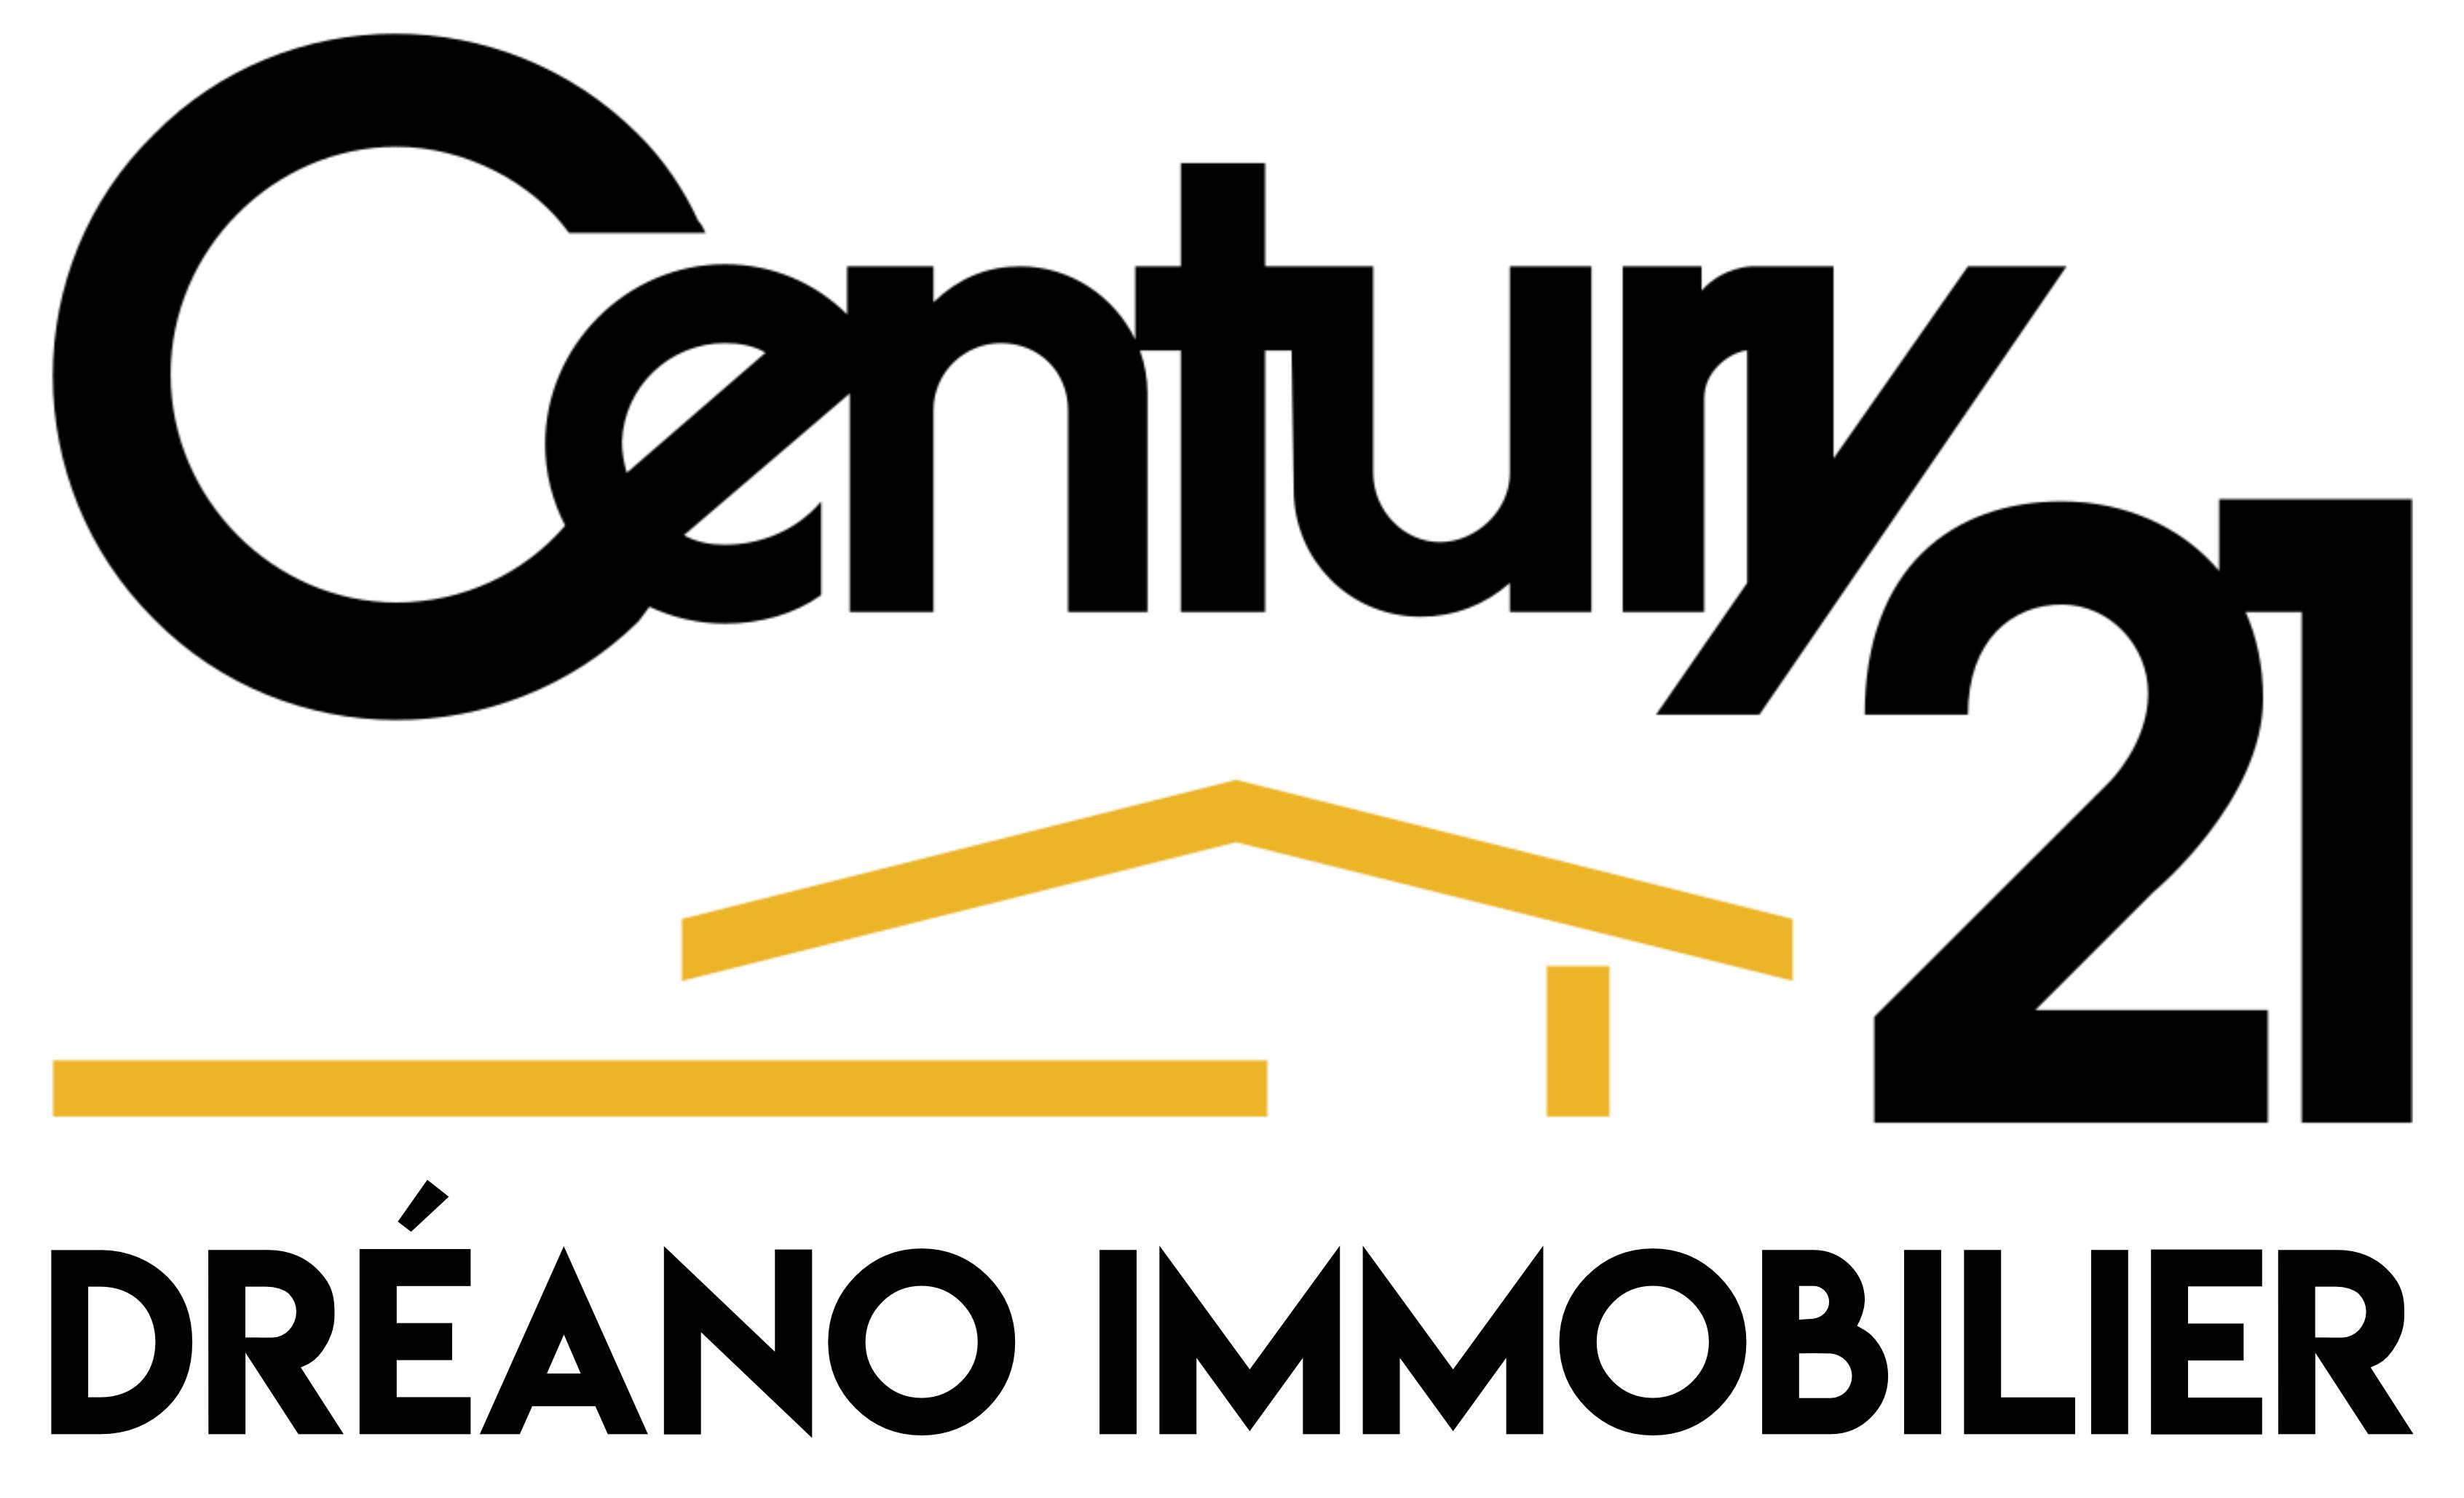 Century 21 - Dréano Immobilier